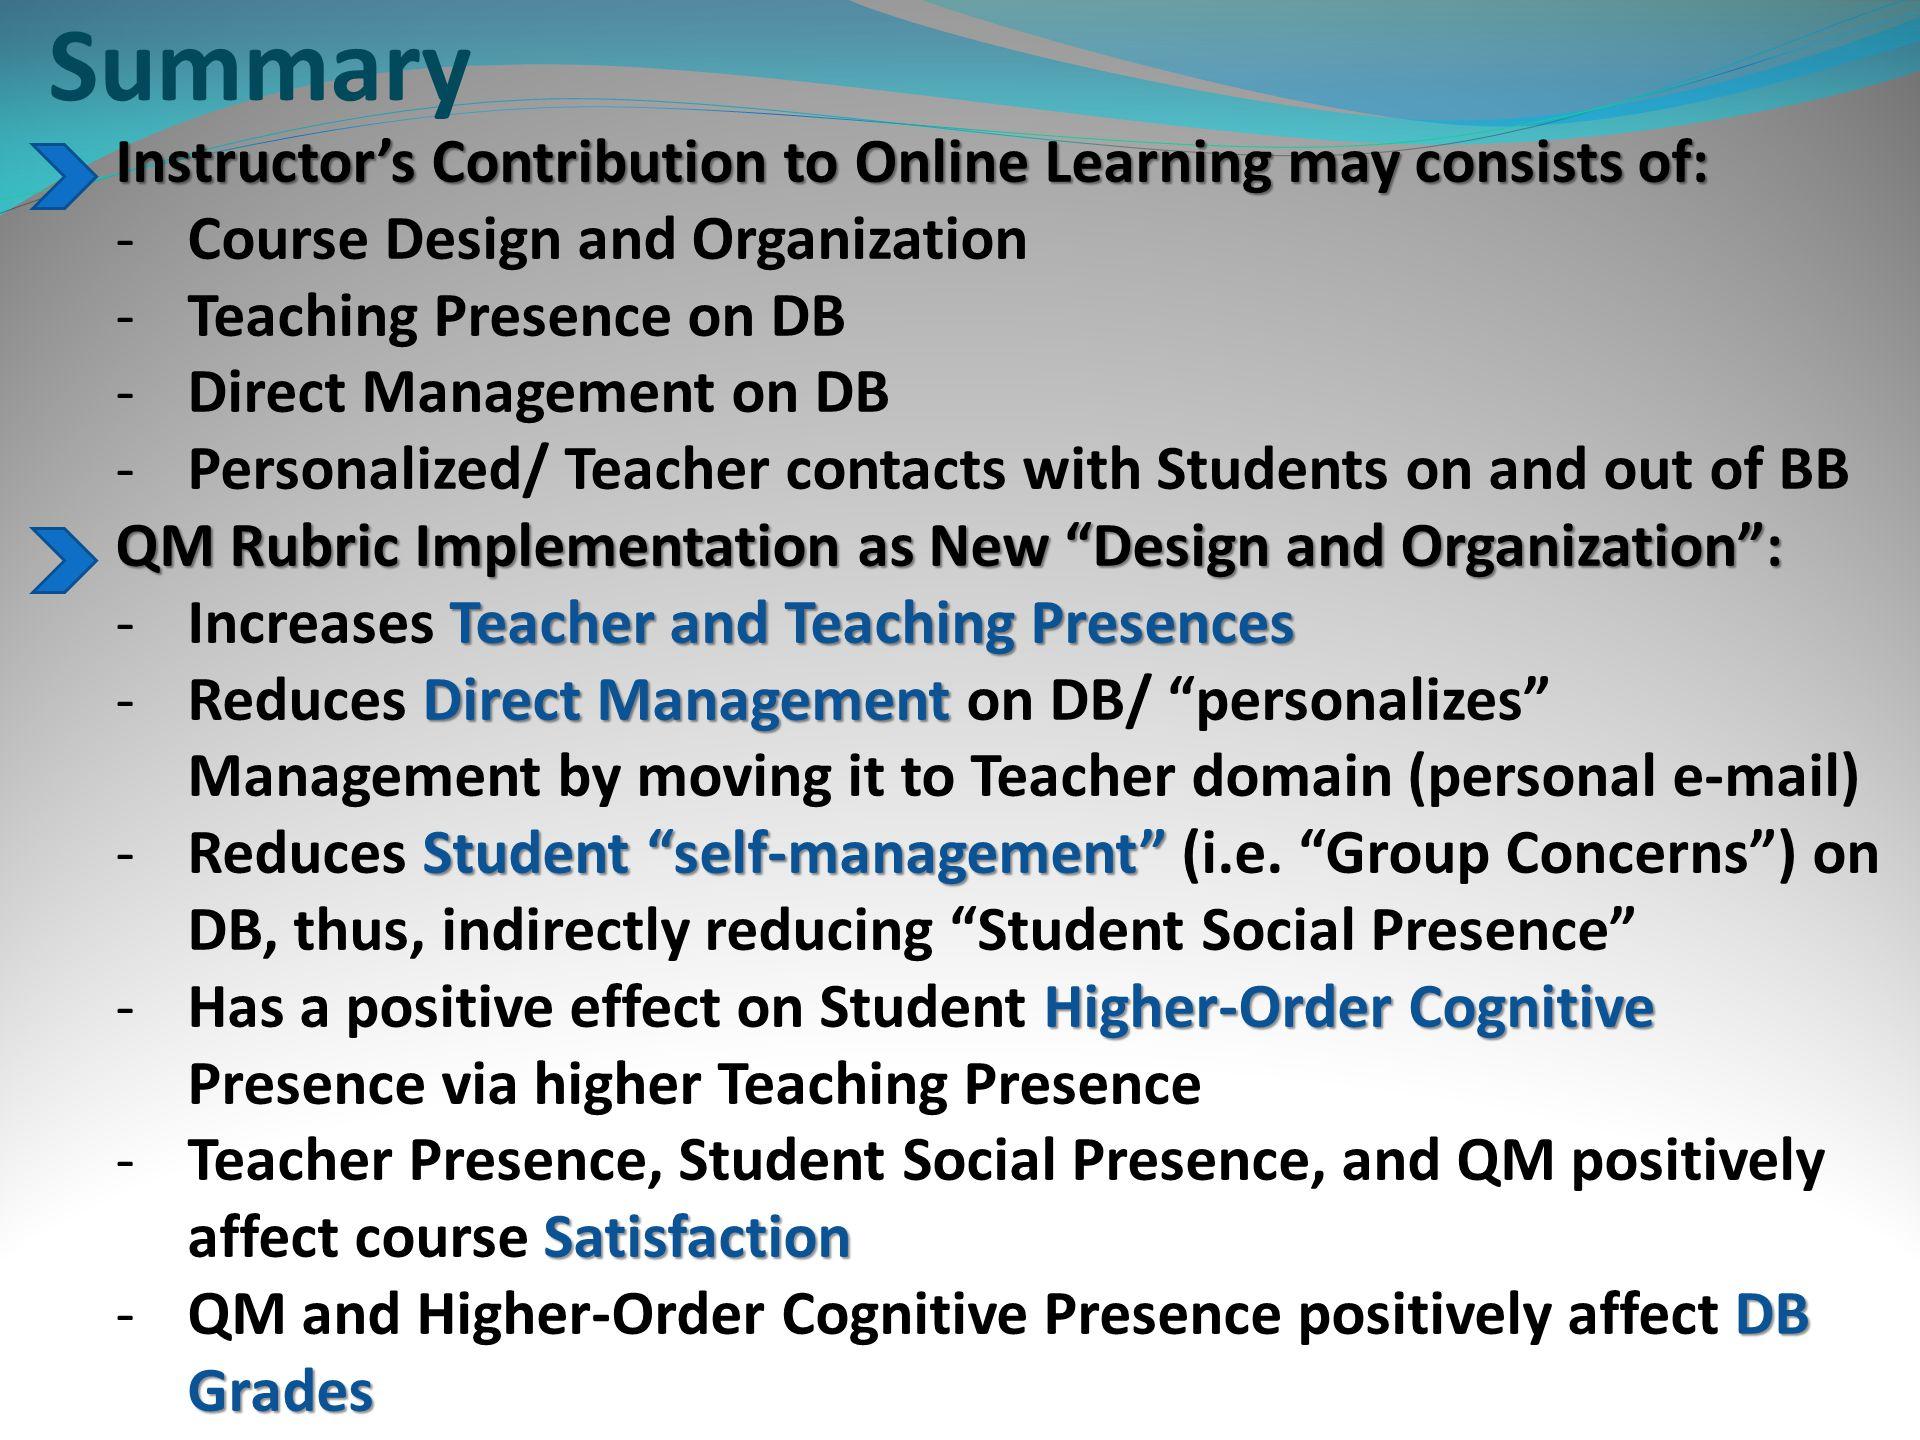 Analysis: EQS 6 CFA: Four-Factor Model of Teacher/Teaching Presences Chi Sq.=65.23 P=0.00 CFI=0.90 RMSEA=0.10